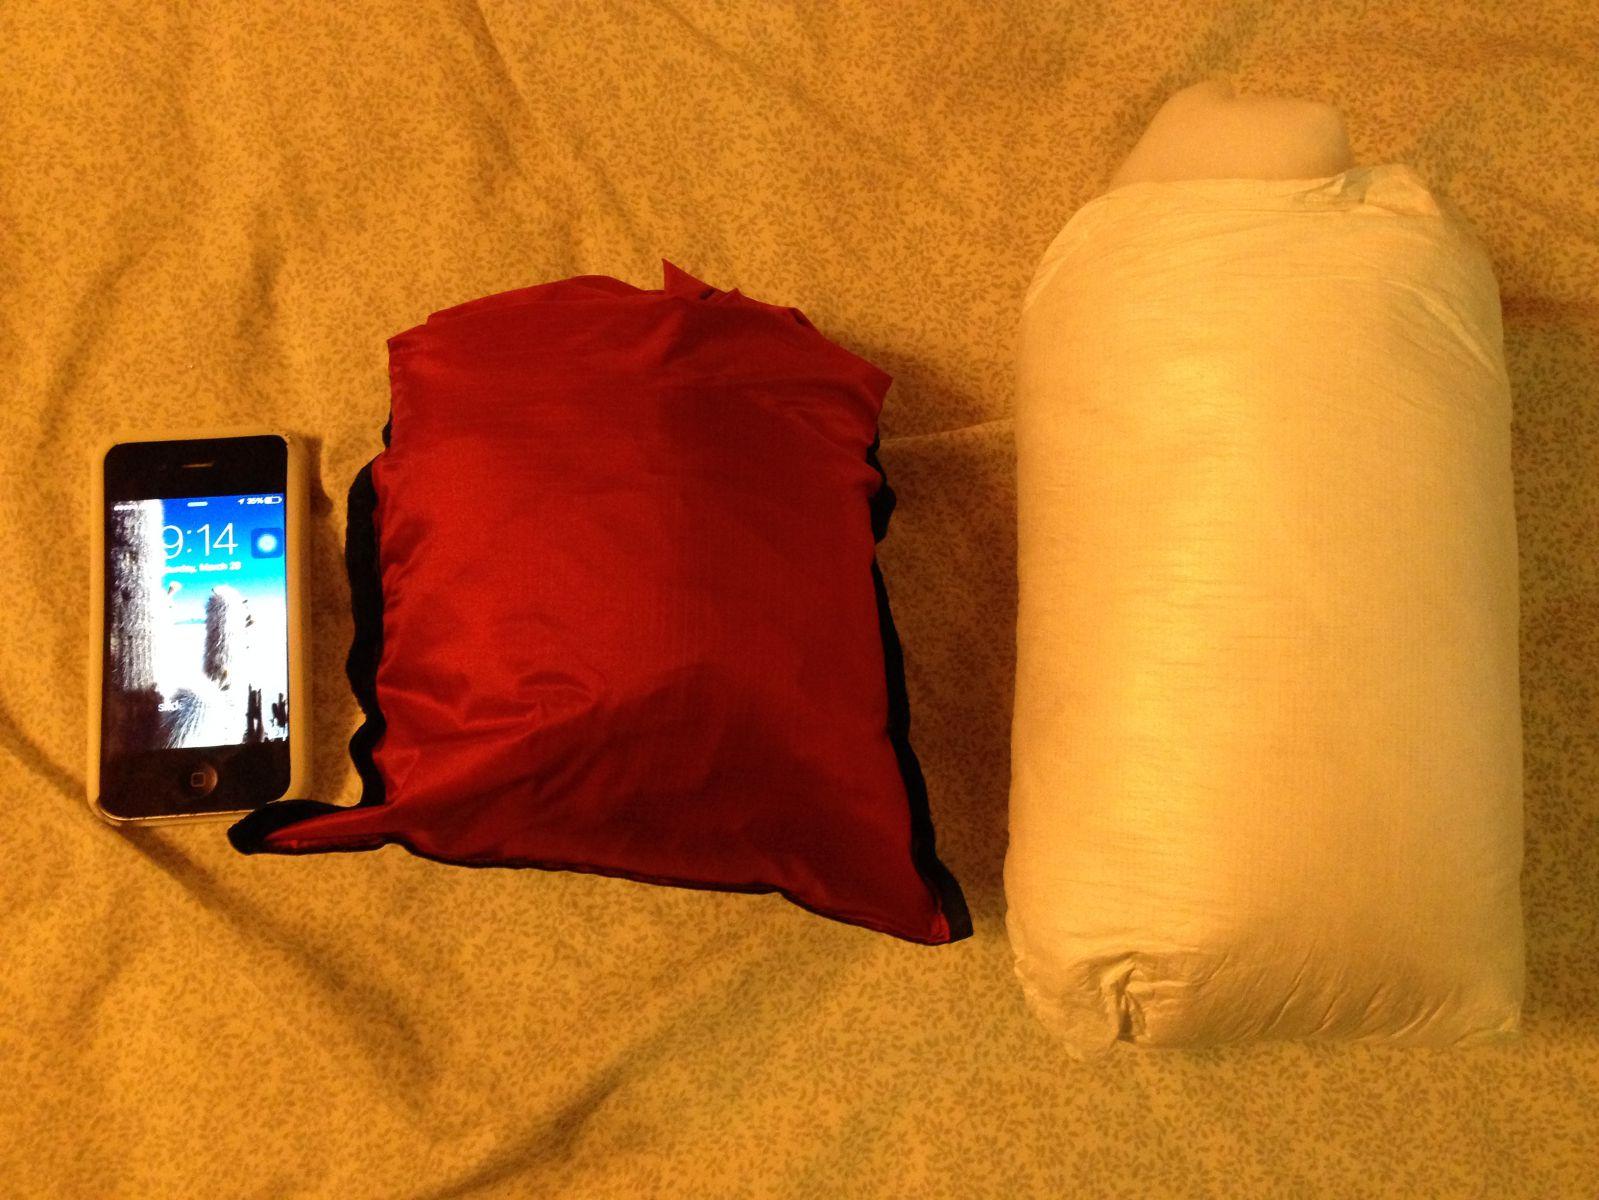 Packed OmniSmock LifePants Insulation